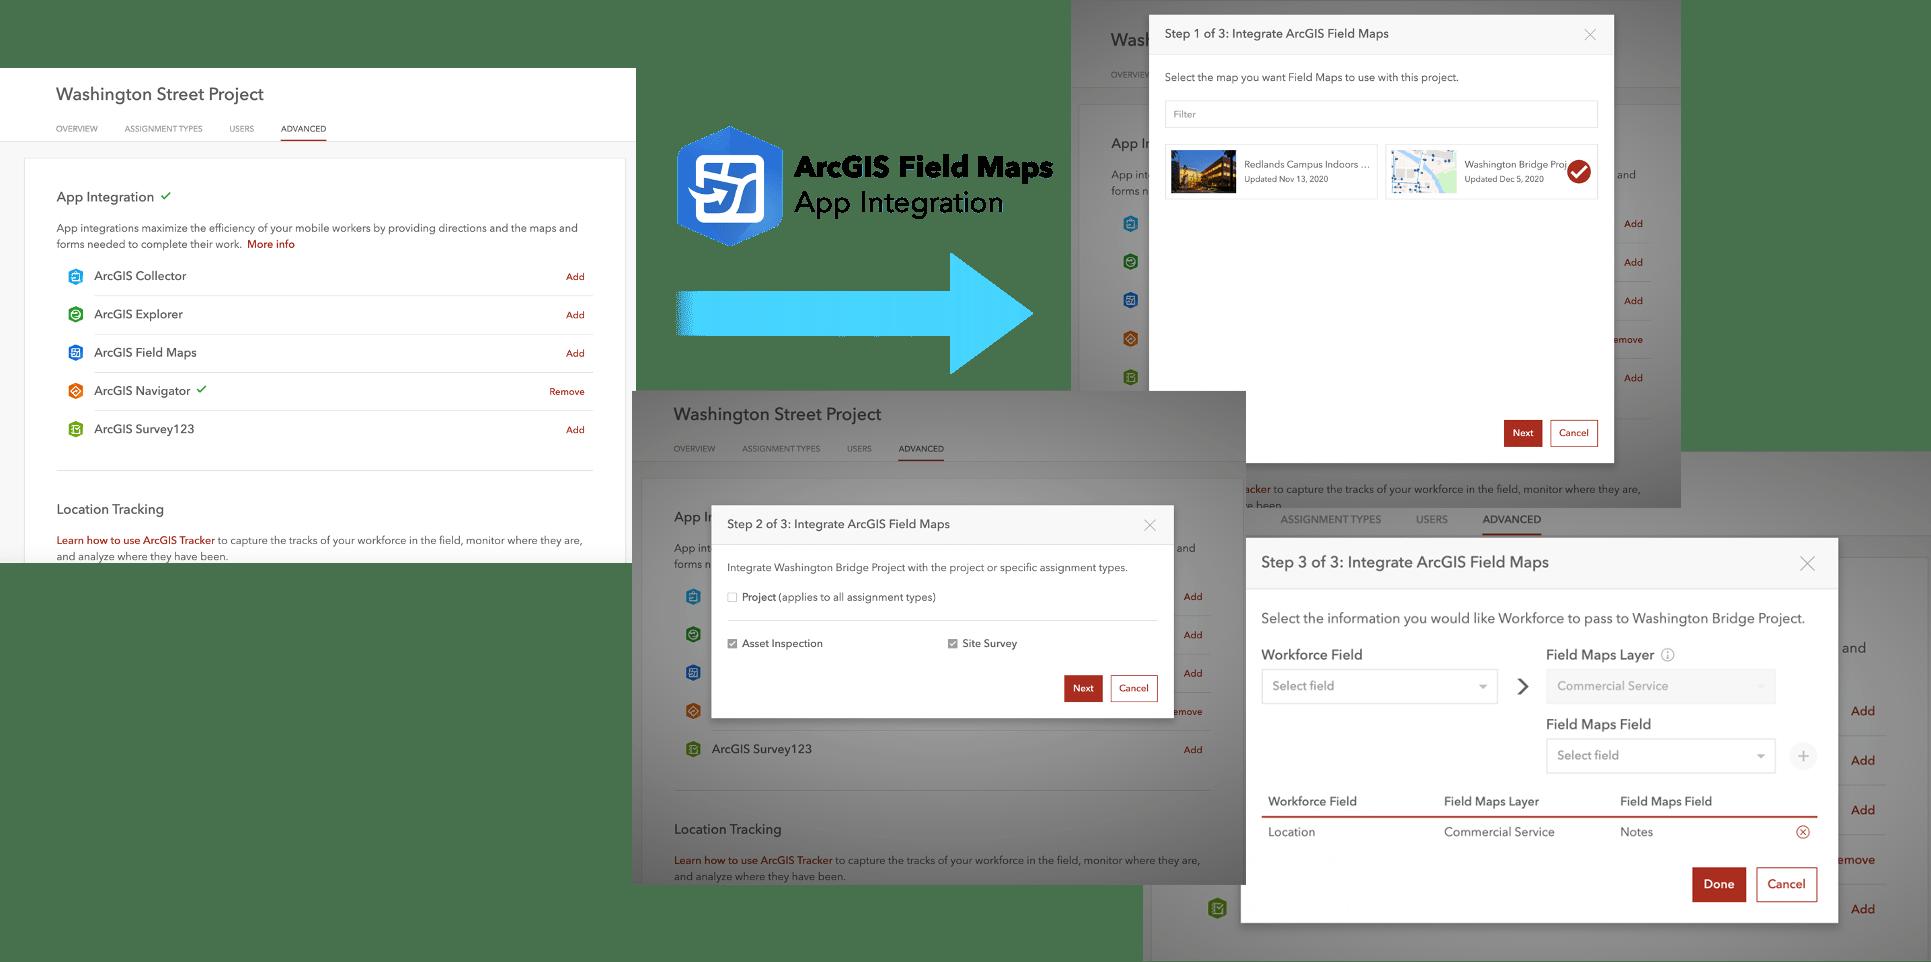 Adding ArcGIS Field Maps integration